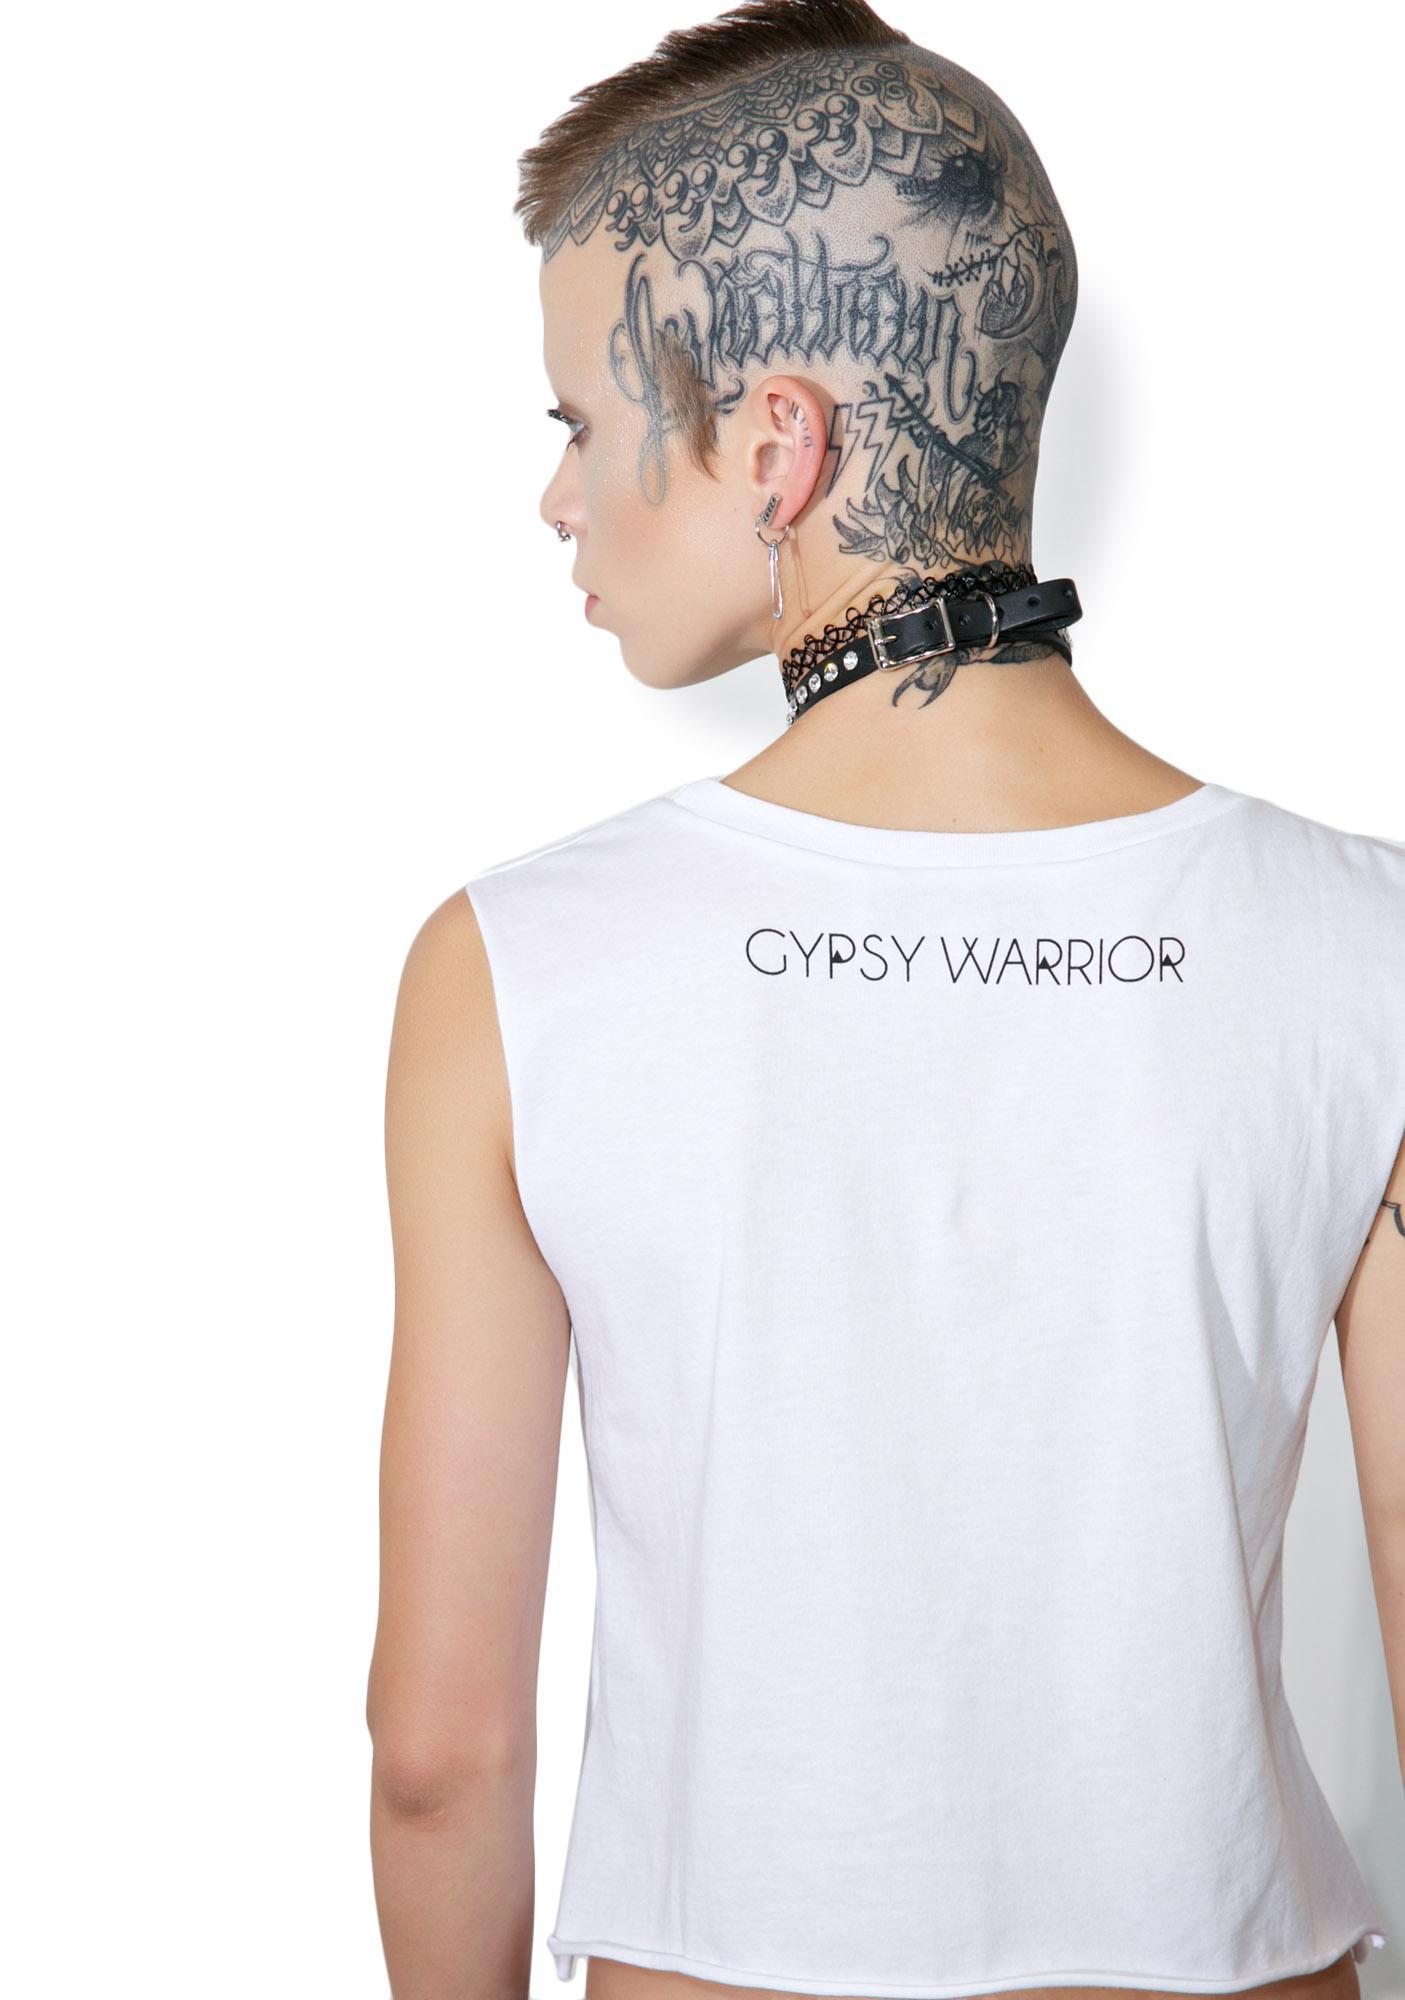 Gypsy Warrior Rolling Stoner Crop Tank